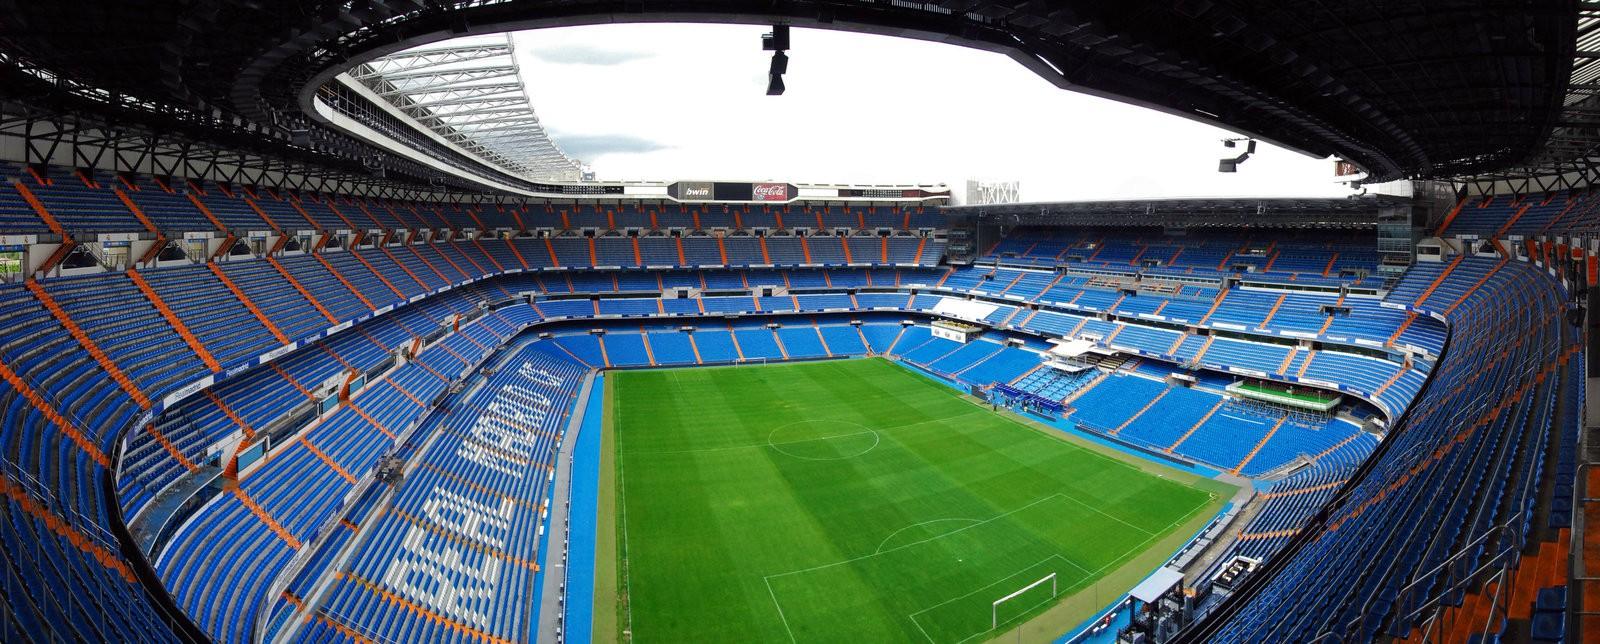 Kumpulan Arsenal Wallpaper Android Market: Wallpaper Stadion Sepak Bola Hd Terlengkap